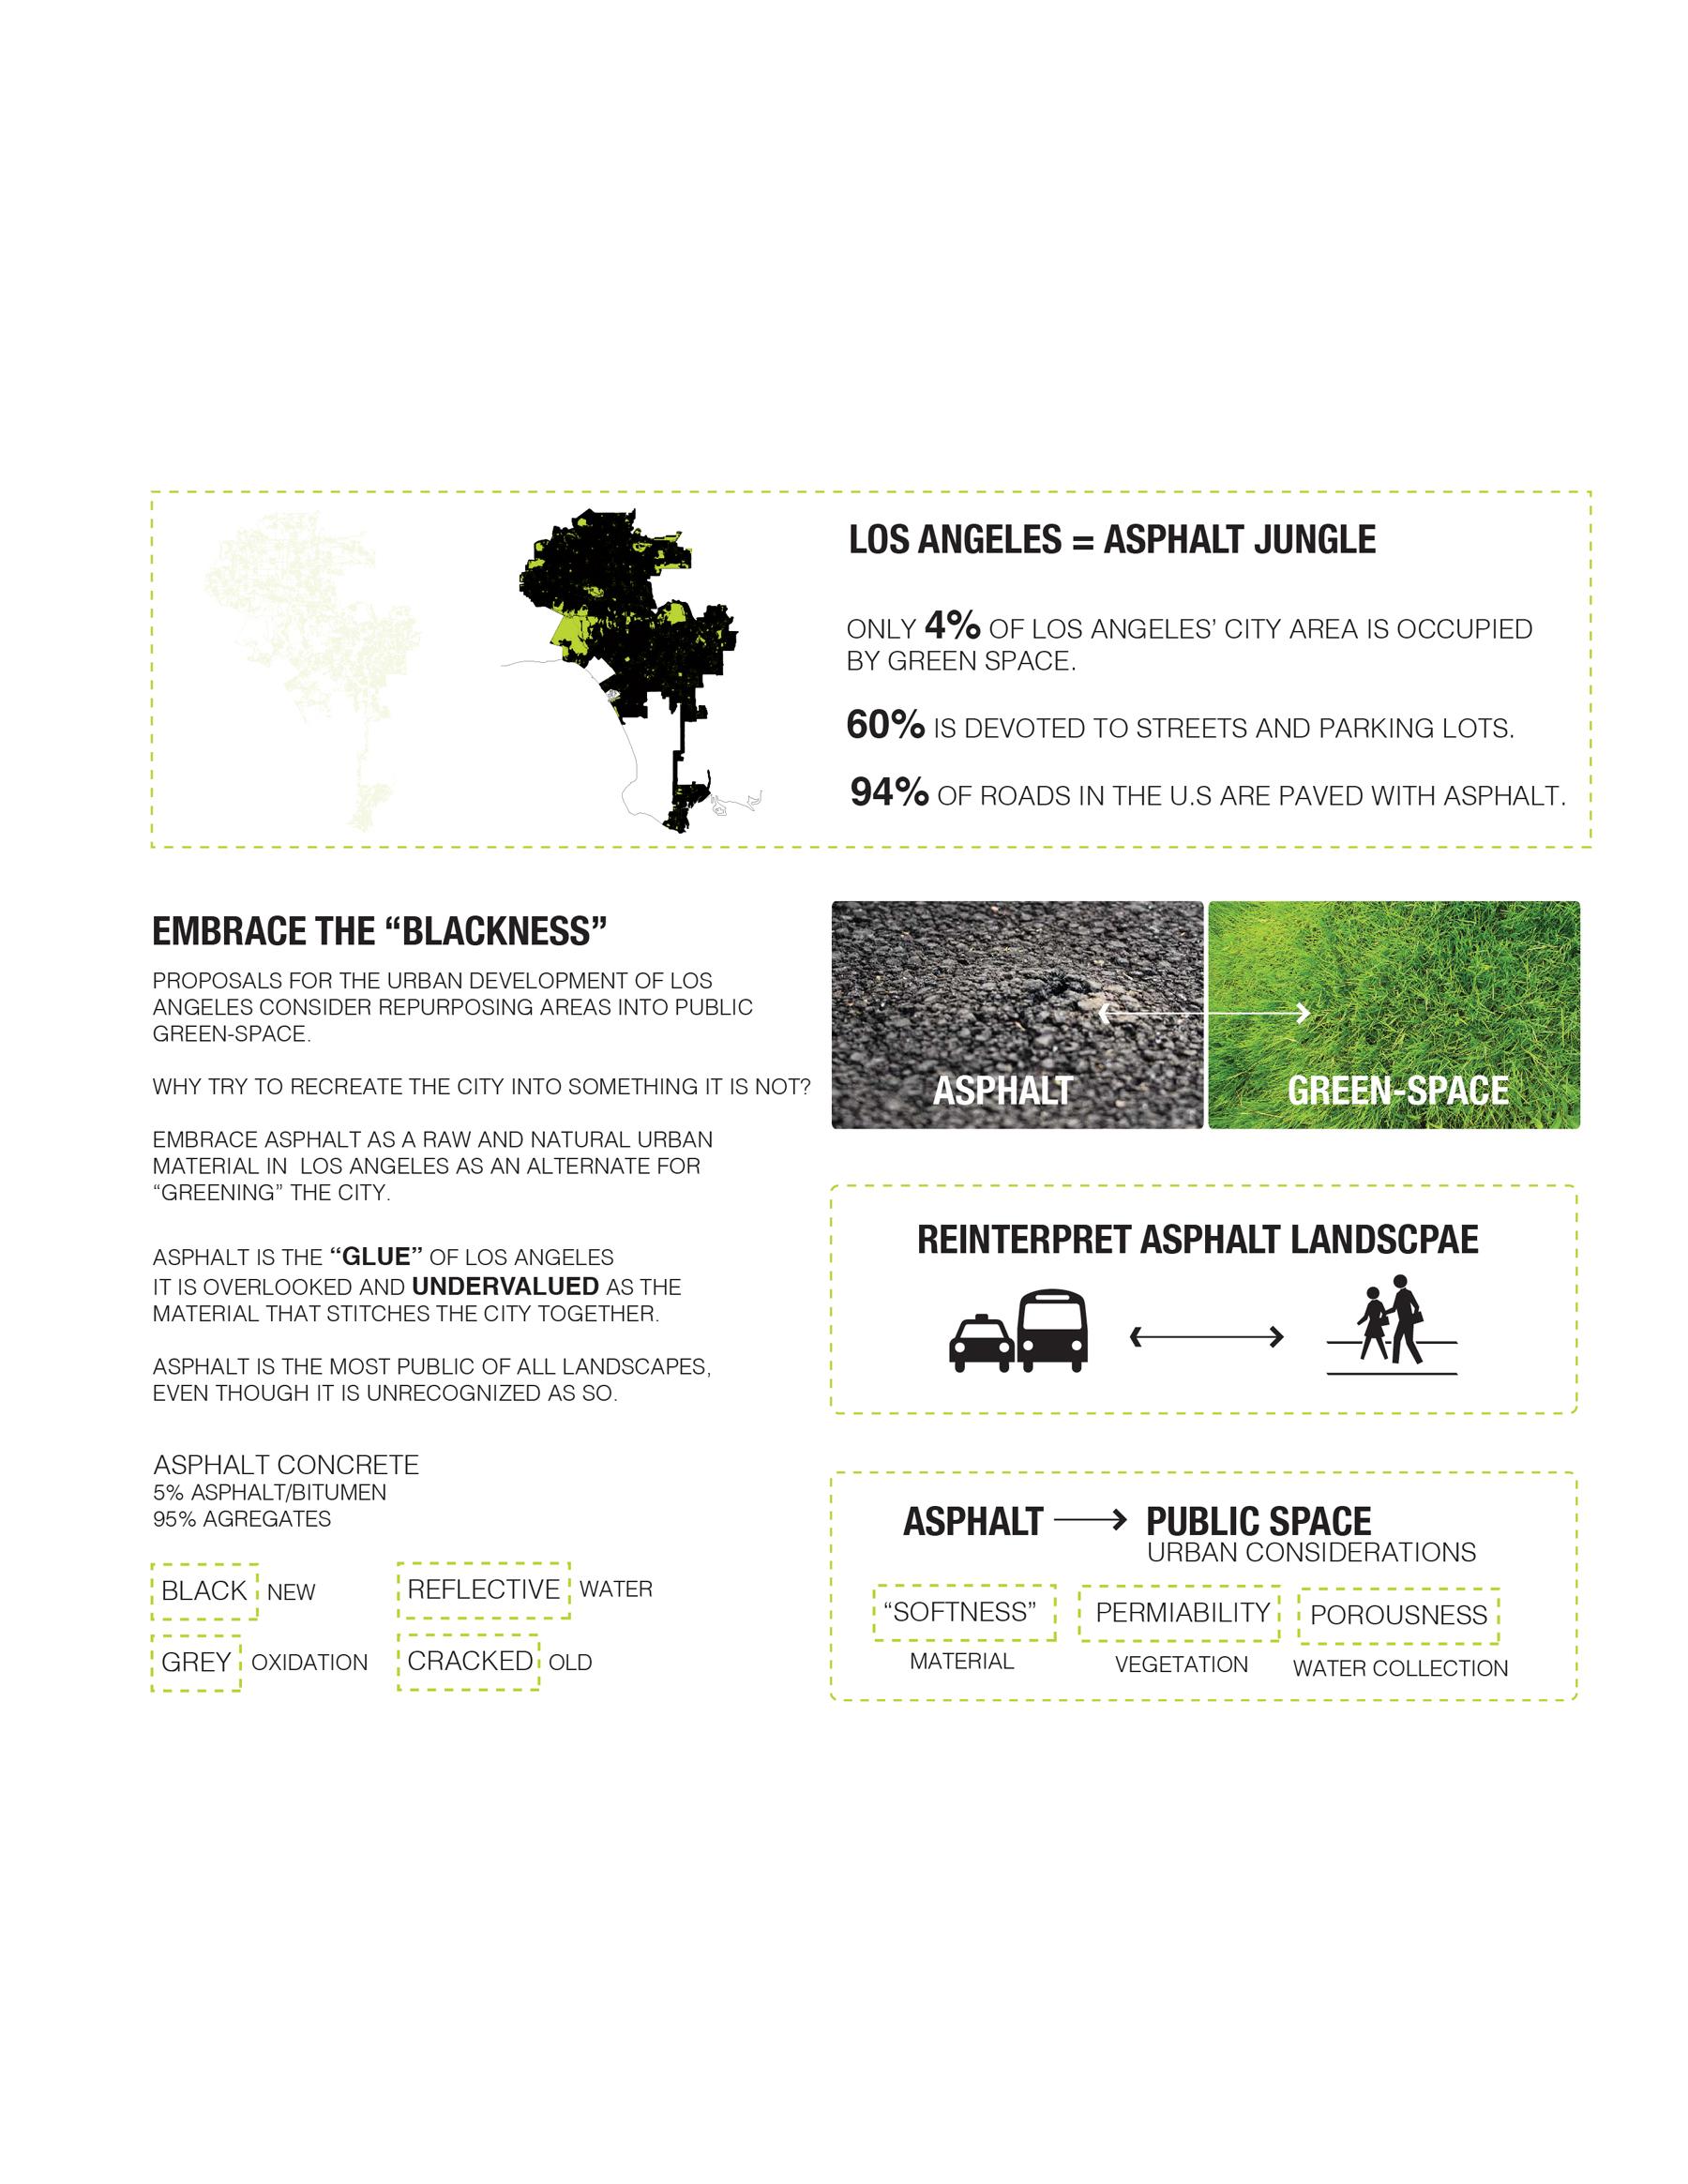 asphalt-urbanscape-concept.jpg